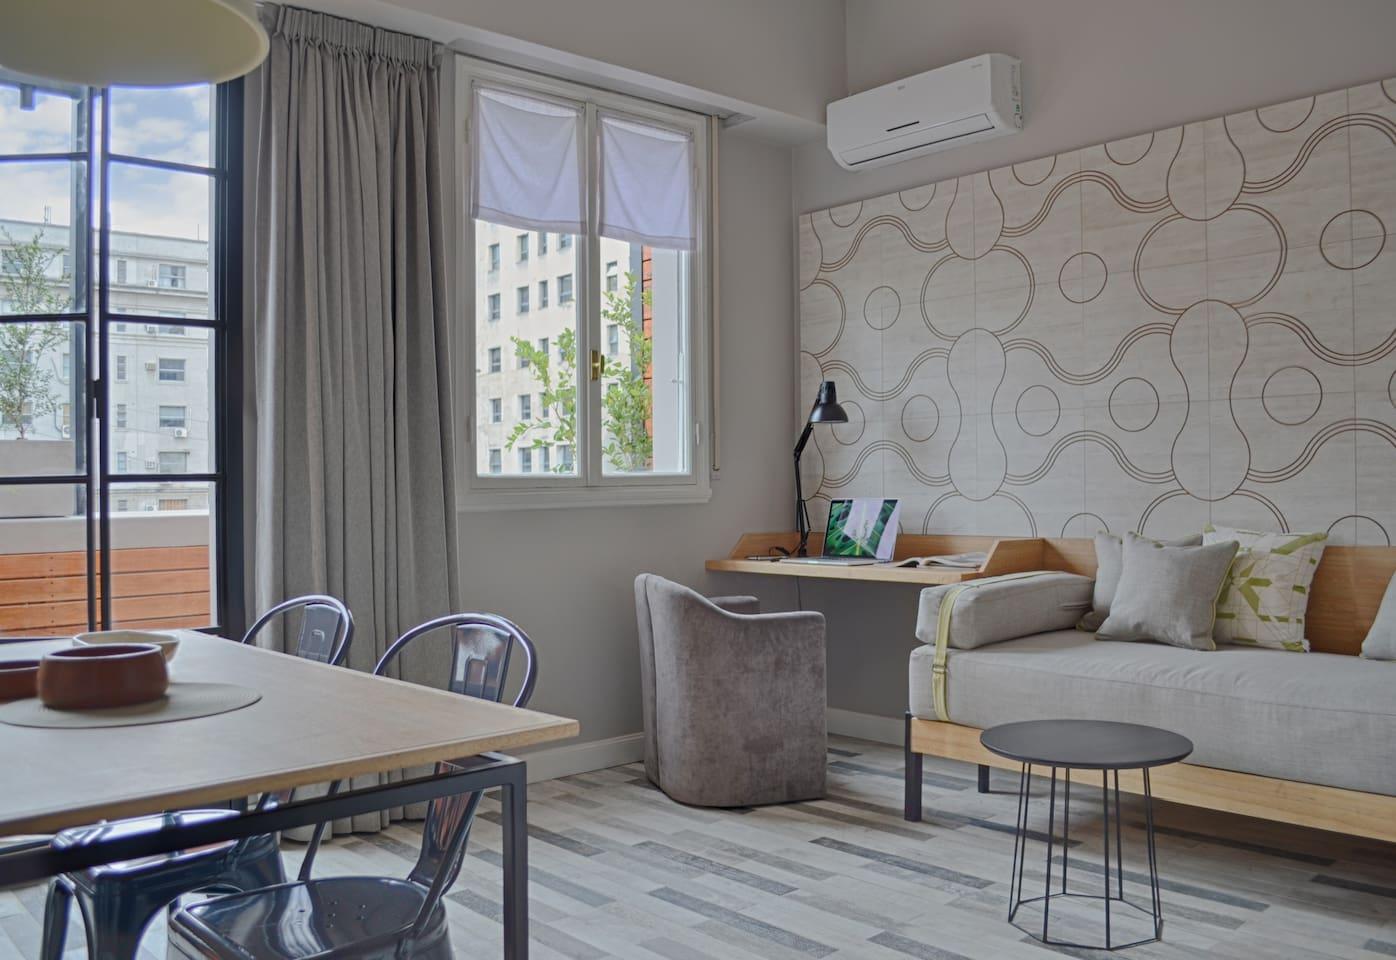 Cozy & stylish apartment.